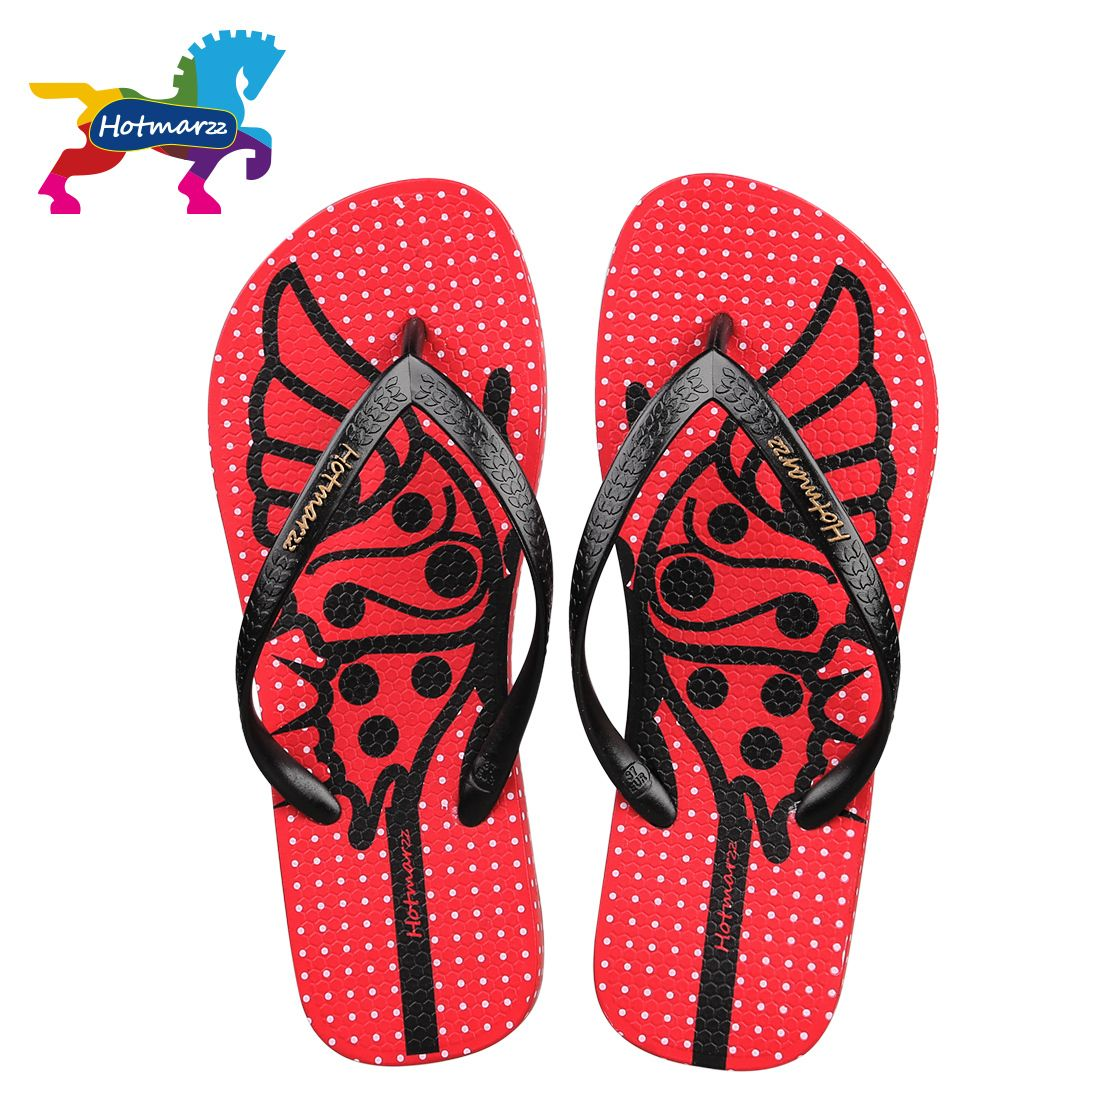 Hotmarzz Women Comfy Anti-skid Fashion Butterfly Flip Flops Ladies ...